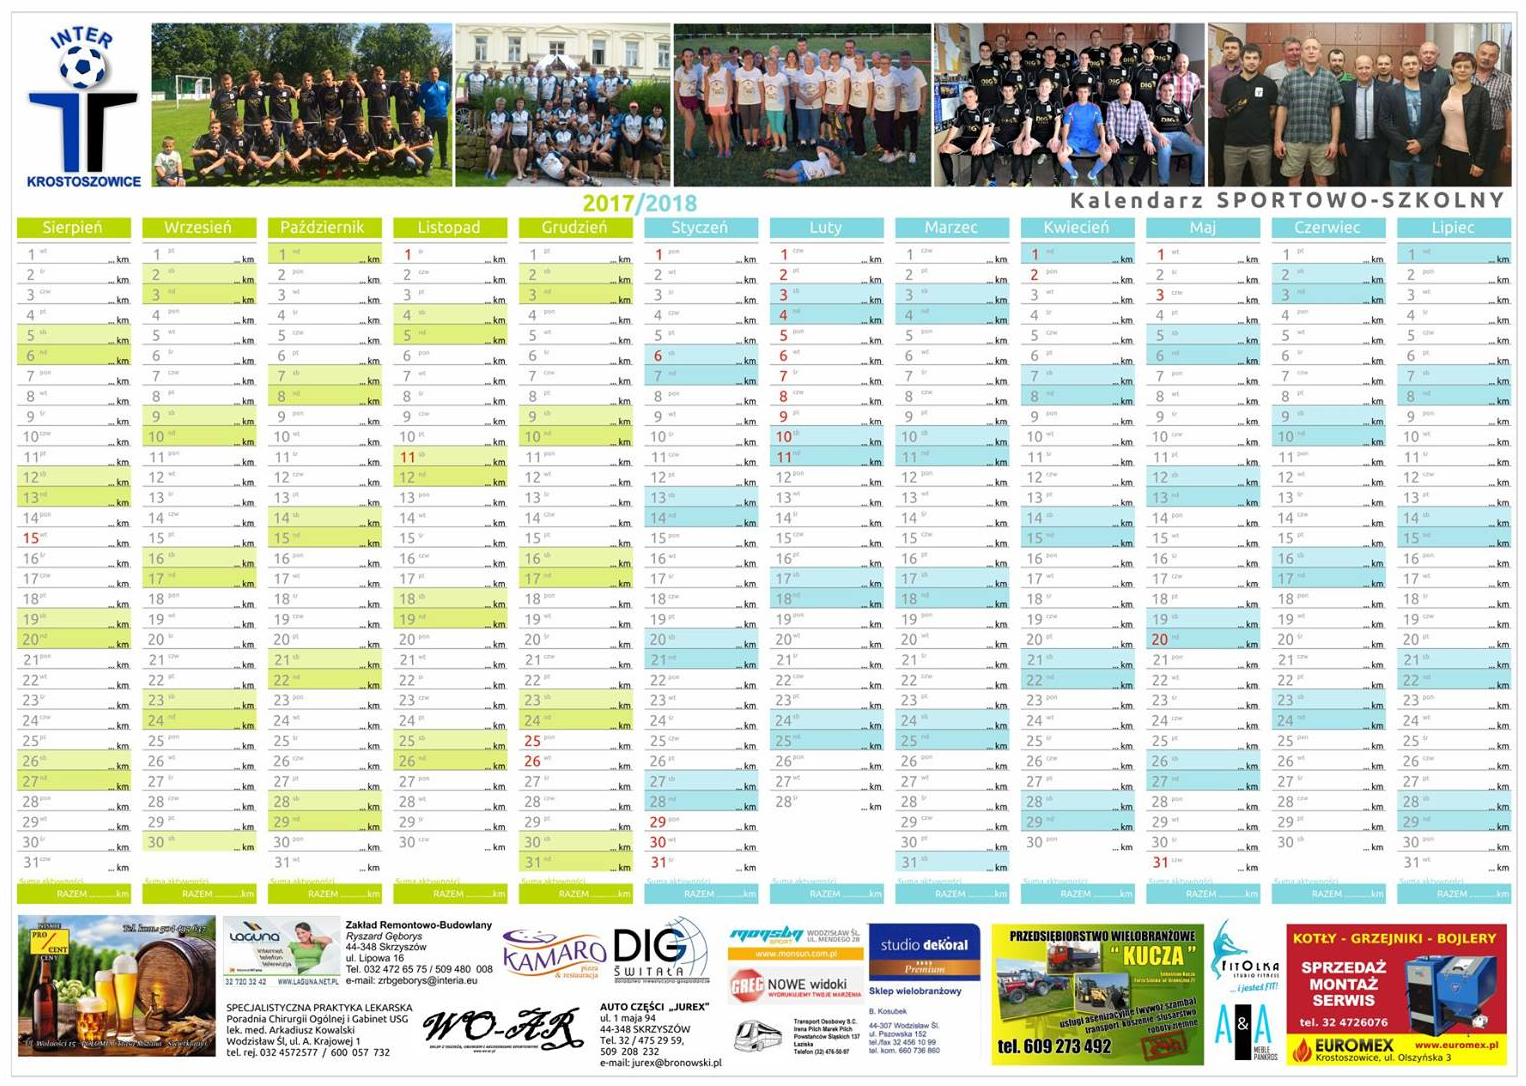 Kalendarz INTER Krostoszowice 2017